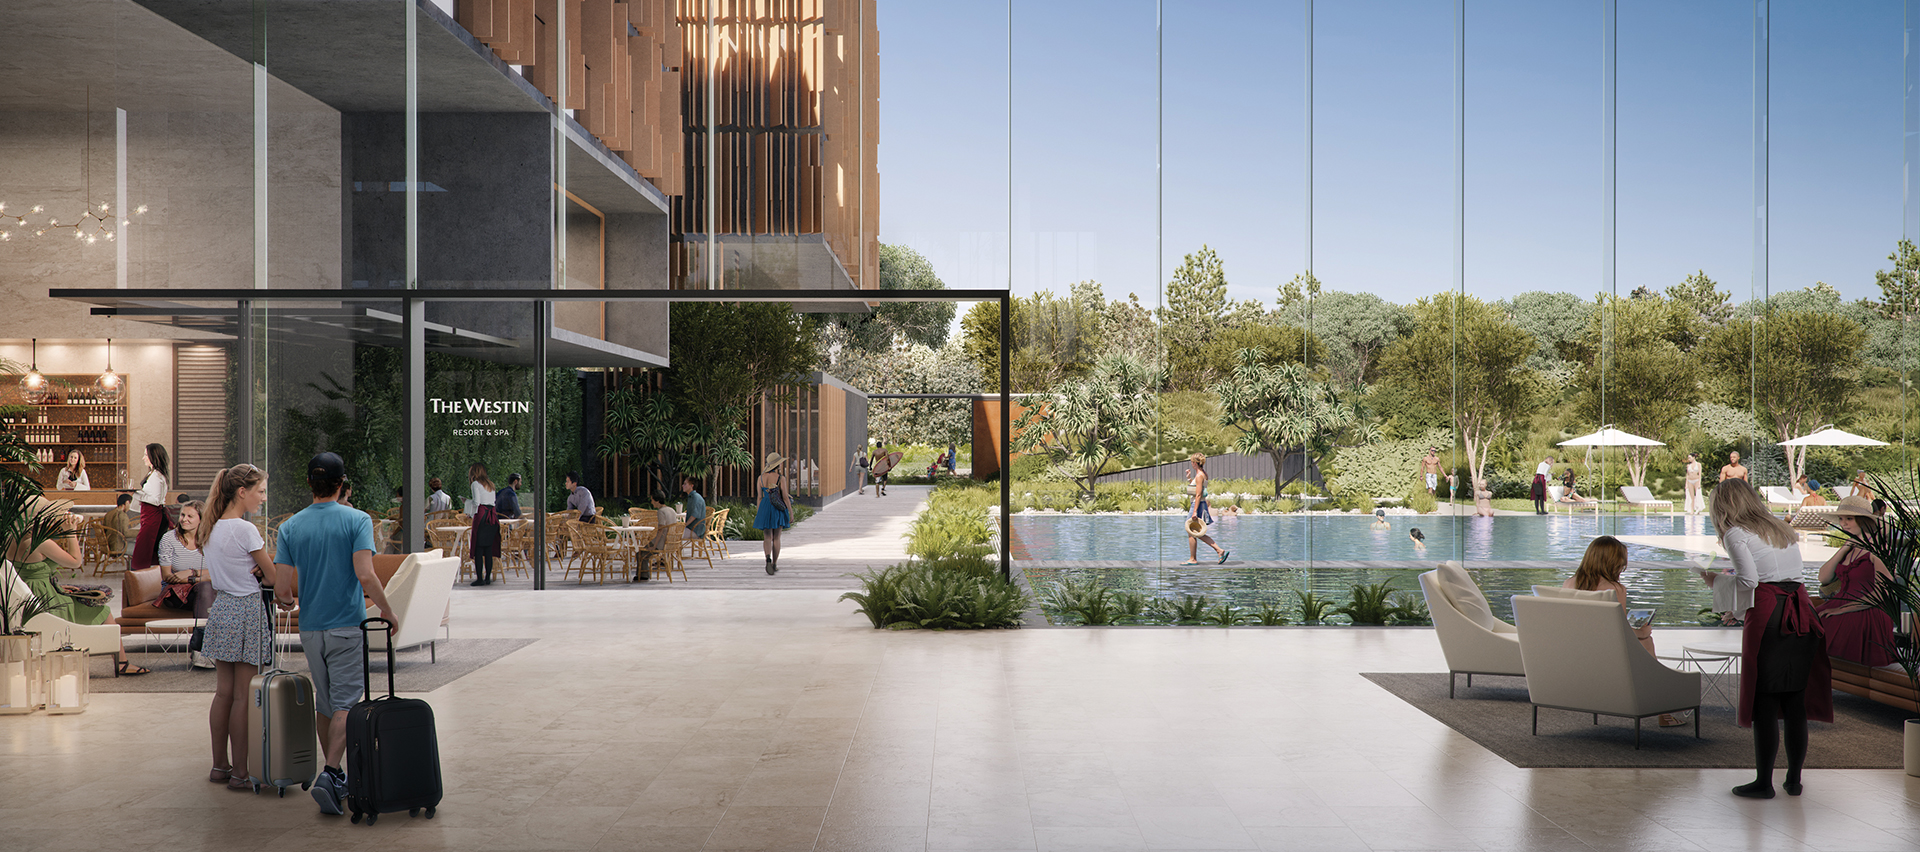 Yaroomba Village Coolum Westin Hotel Proposal